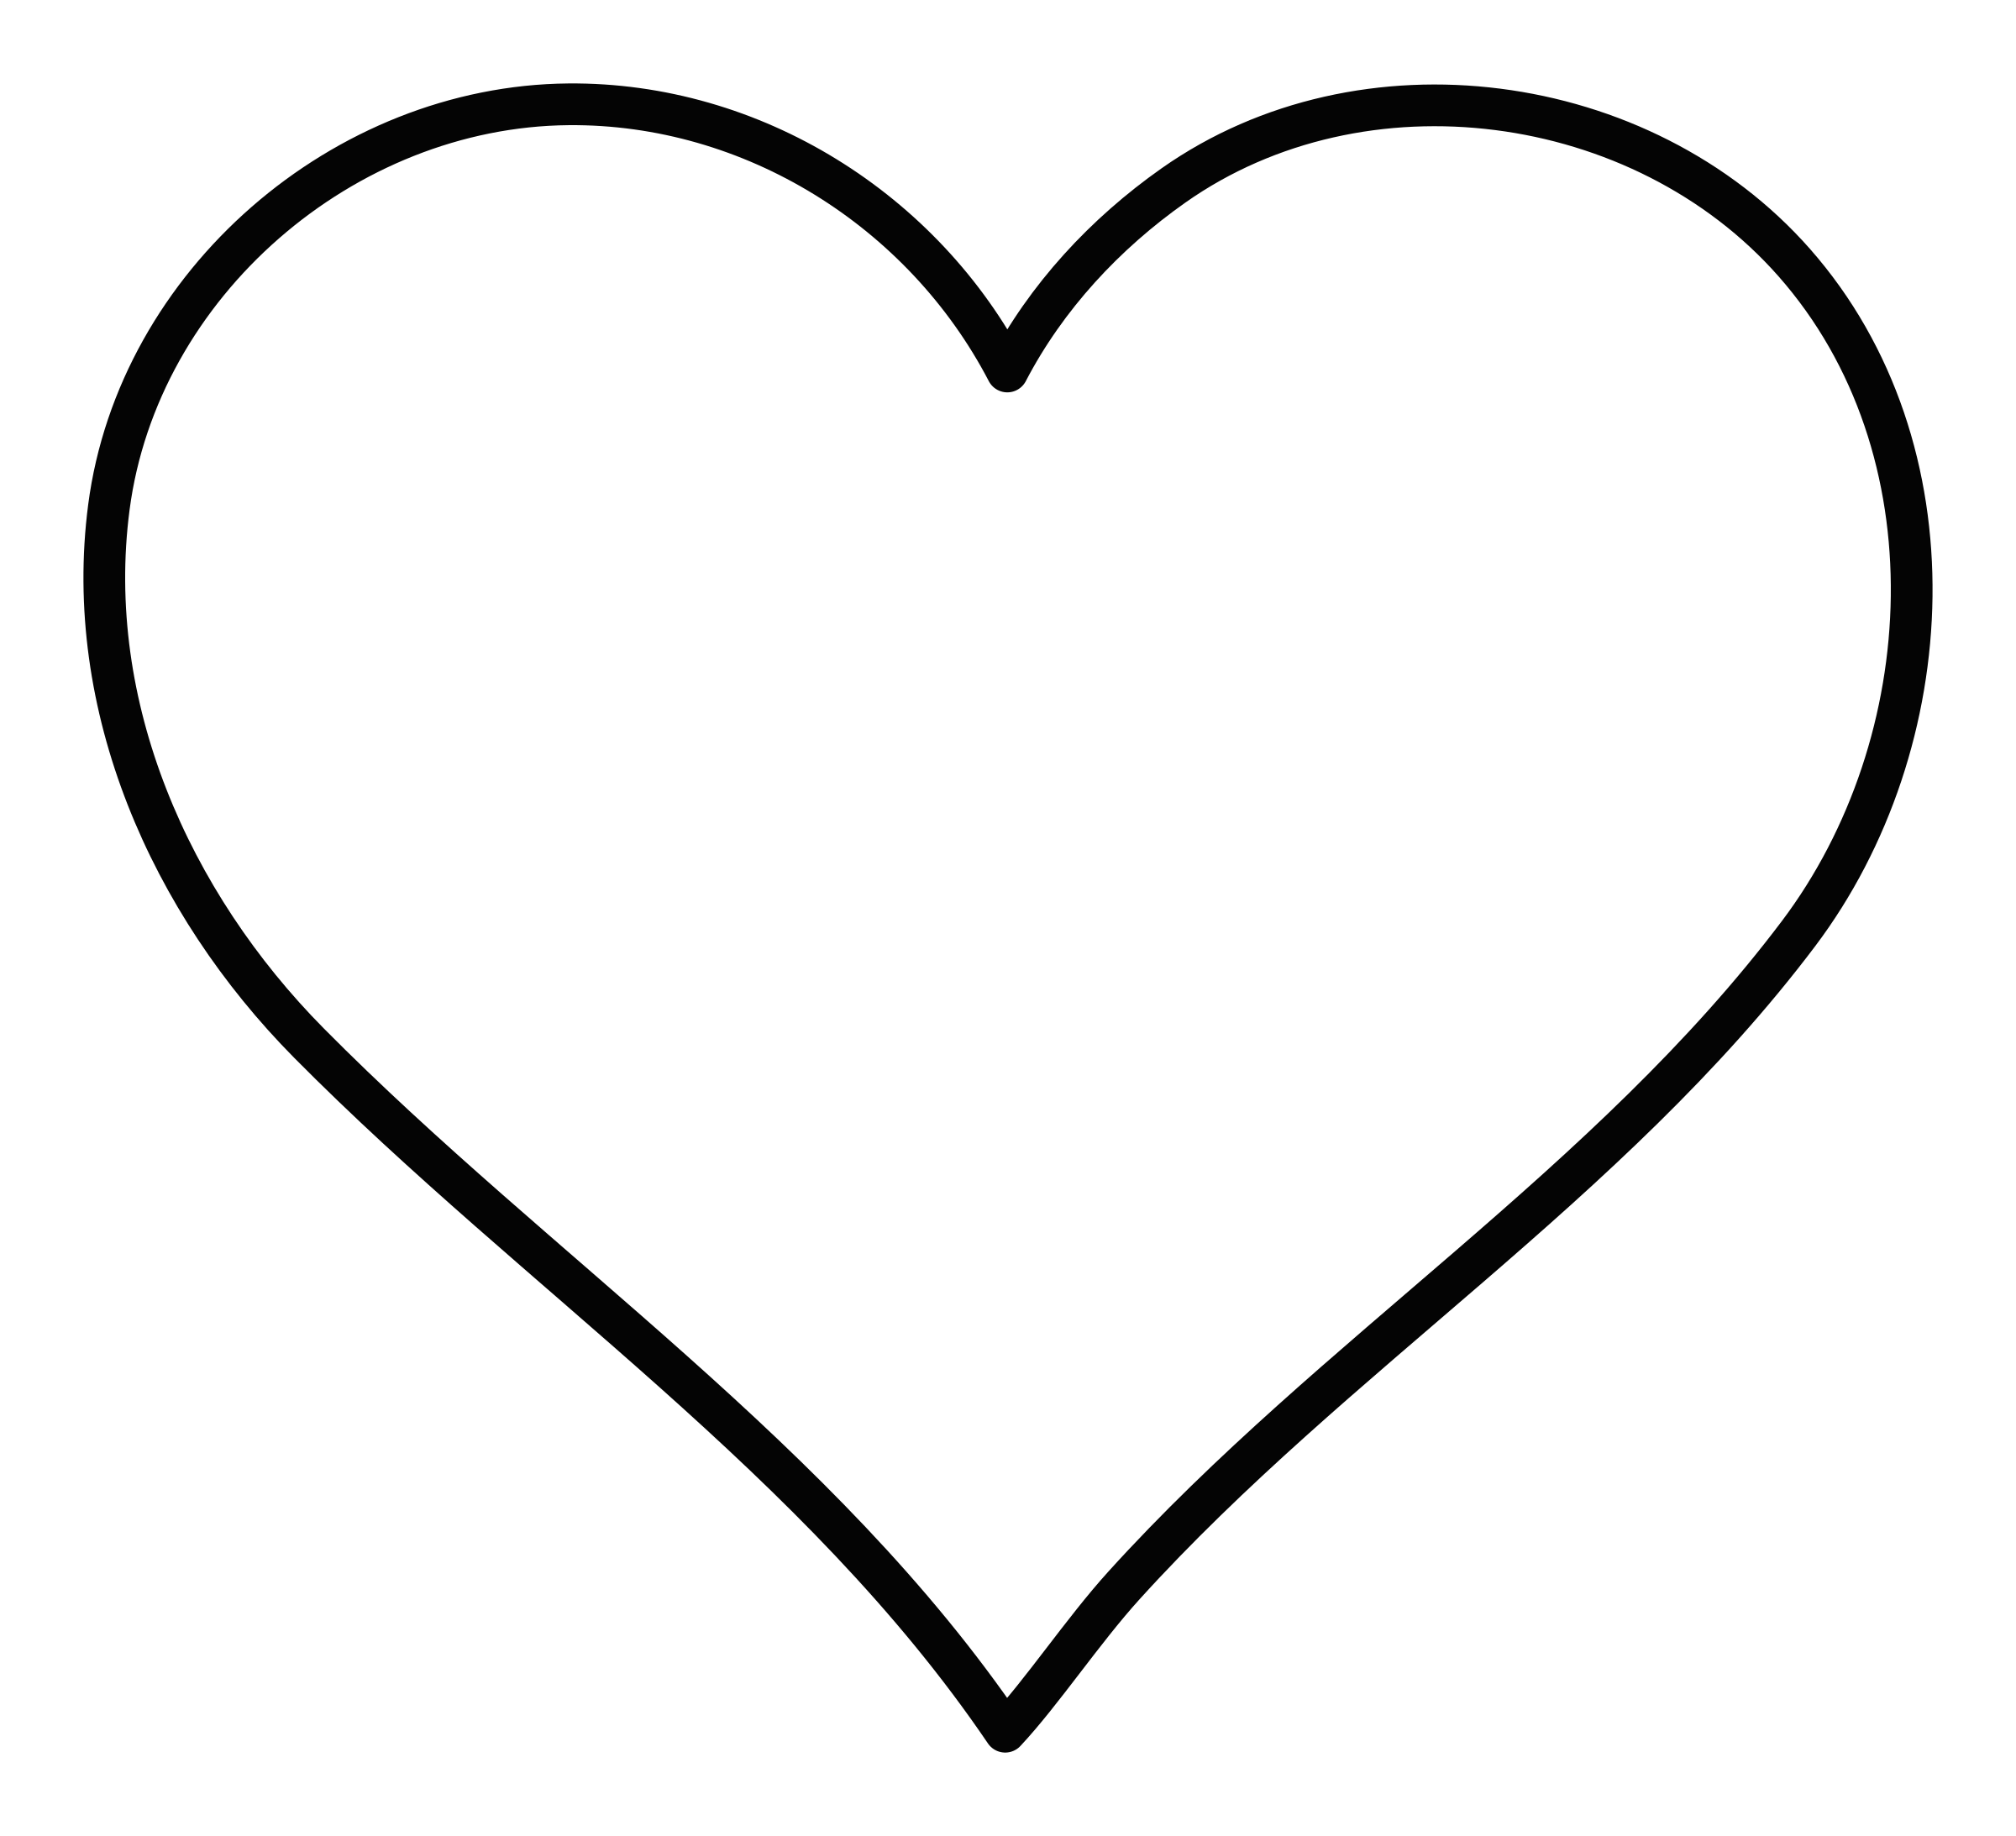 Clipart - Heart outline